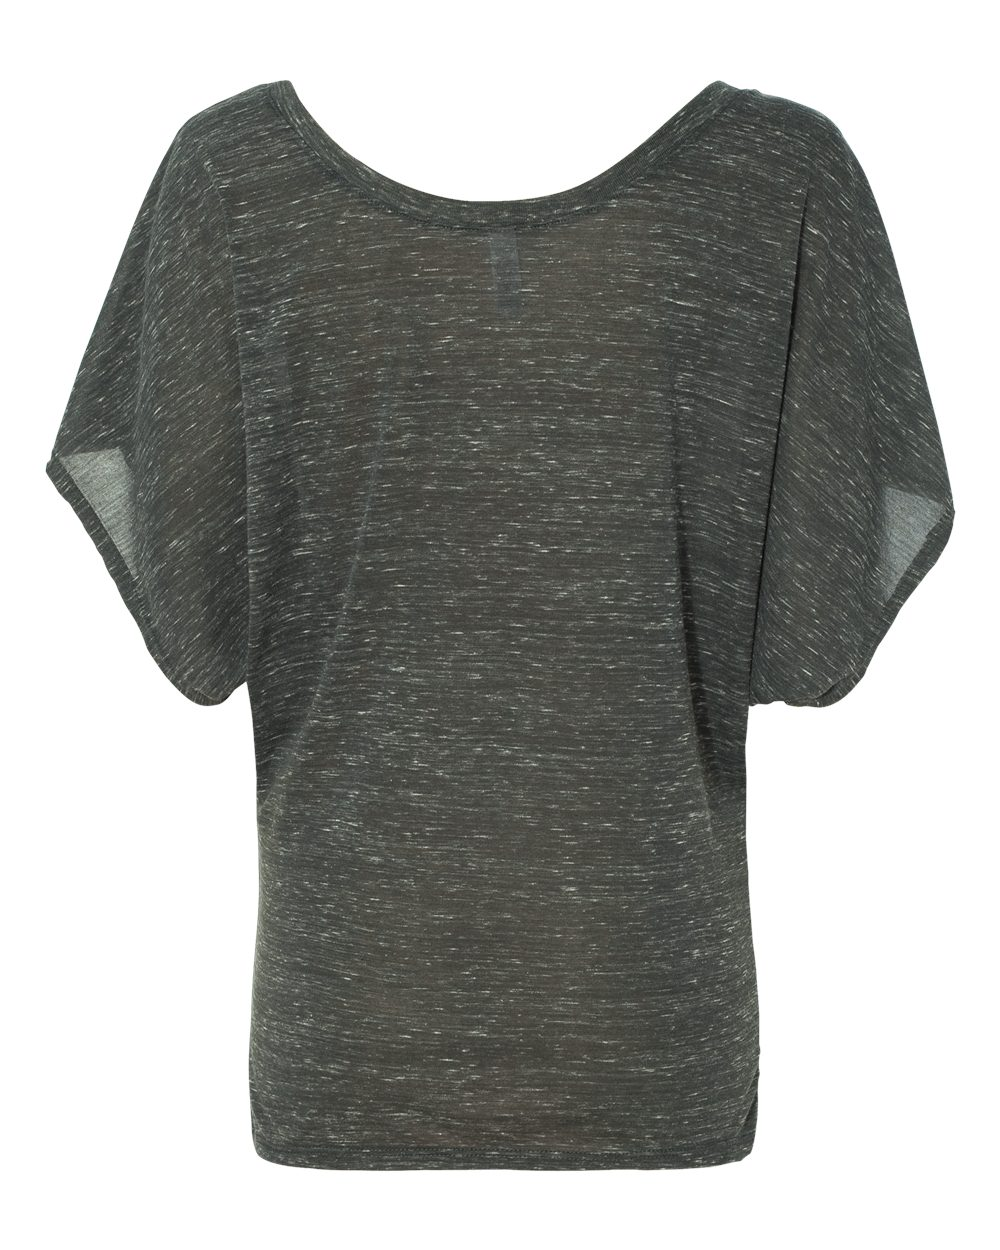 Bella-Canvas-Women-039-s-Flowy-Draped-Sleeve-Dolman-T-Shirt-8821-S-2XL thumbnail 28